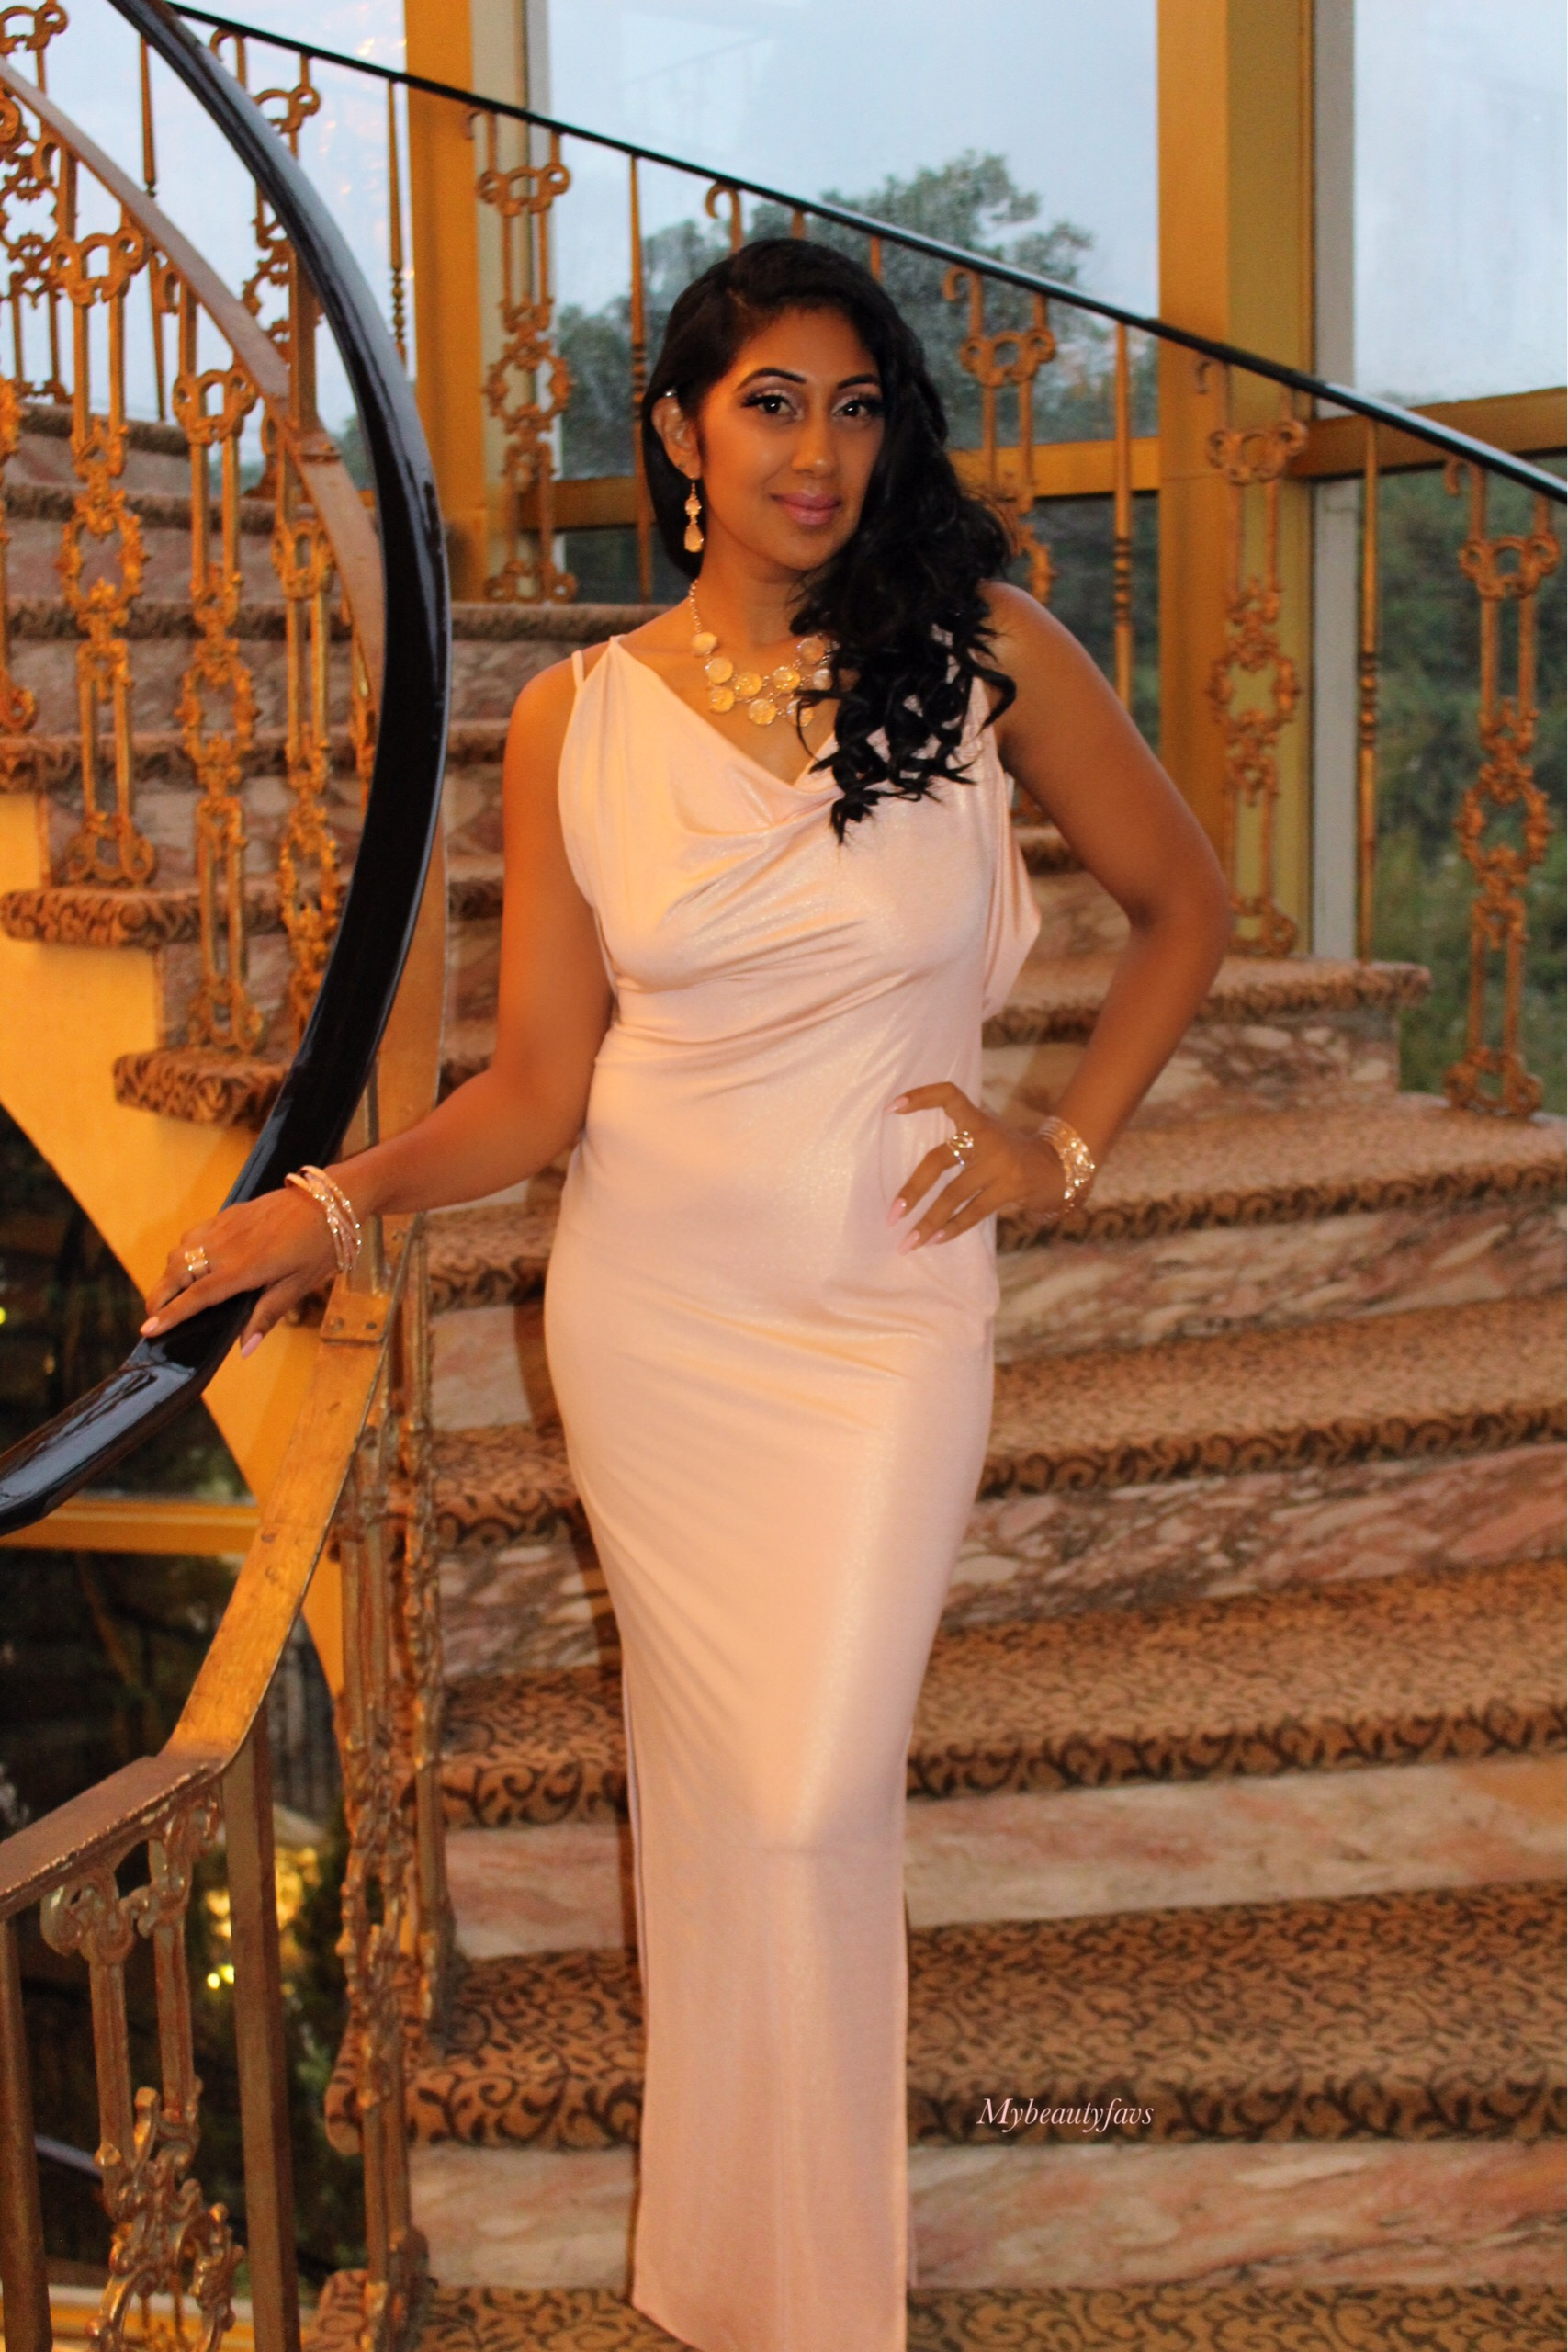 House of CB - Leonetta Blush Shimmer Maxi Dress